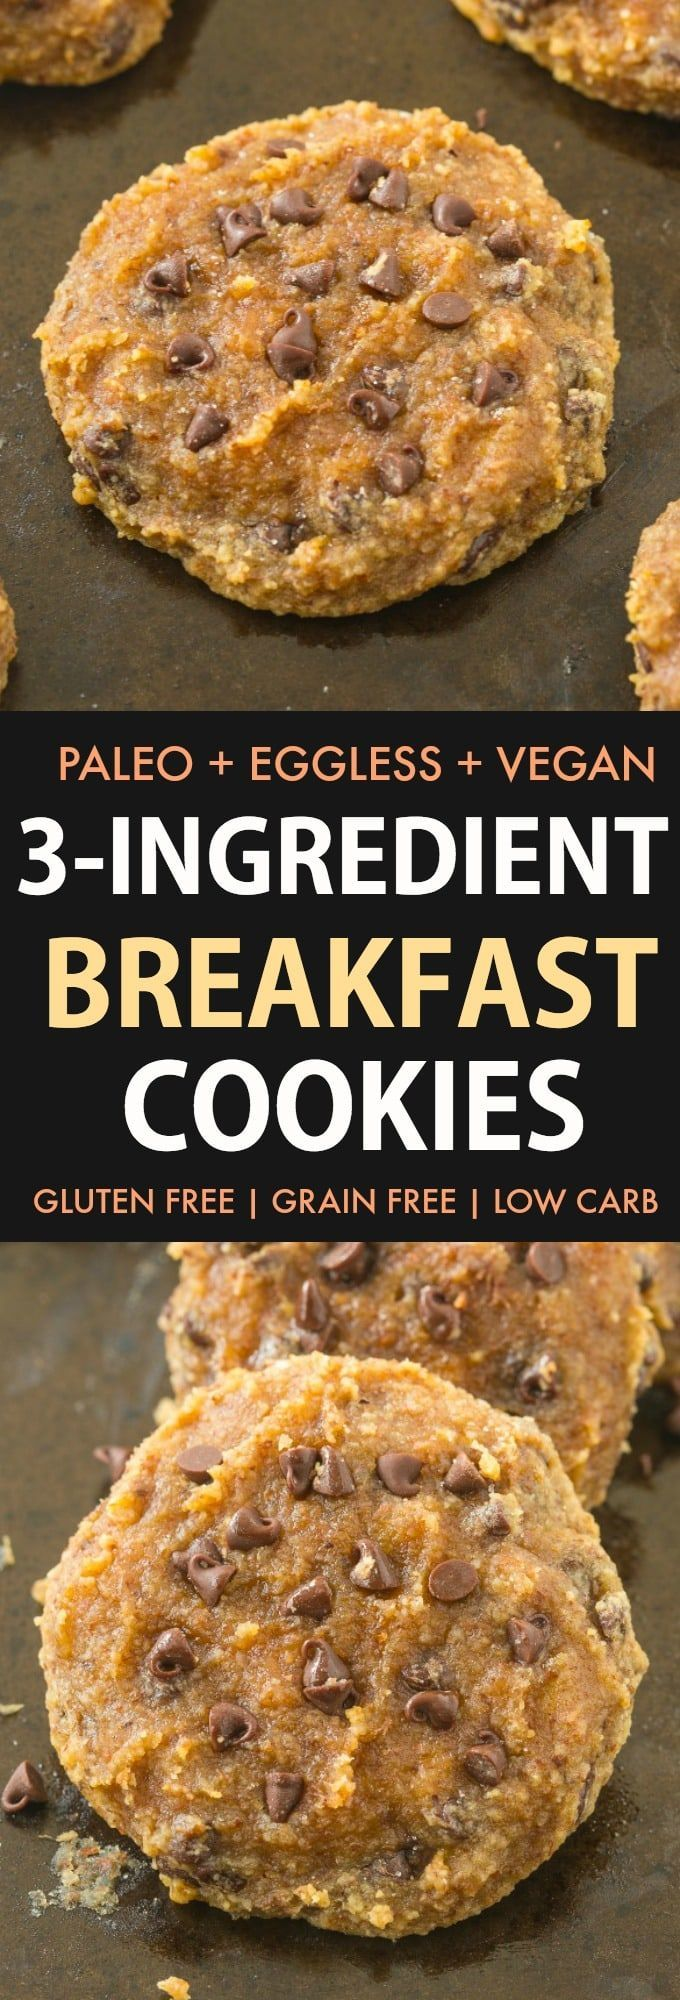 3 Ingredient Paleo Breakfast Cookies Vegan Gluten Free The Big Man S World Recipe In 2020 Paleo Breakfast Cookies Paleo Cookies Paleo Recipes Breakfast